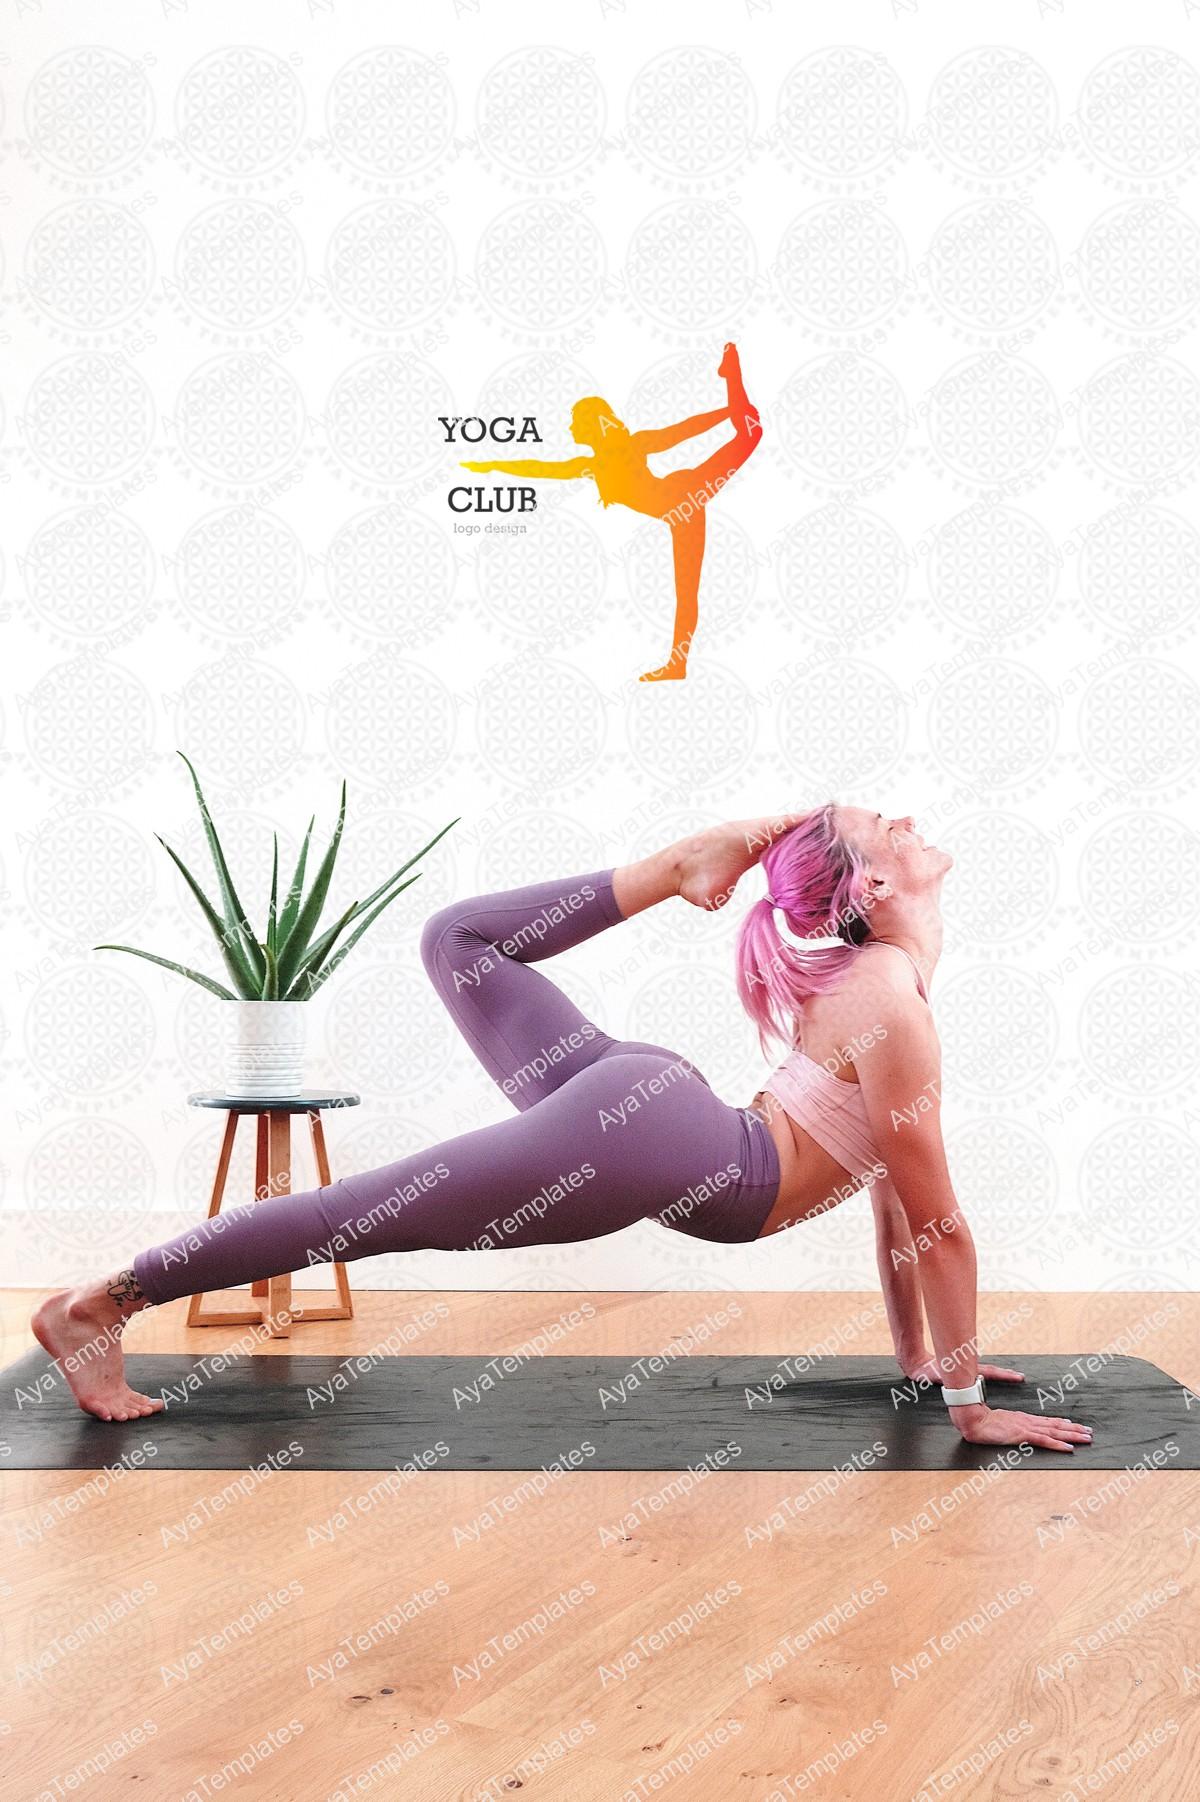 Yoga-Club-logo-design-collage-ayatemplates